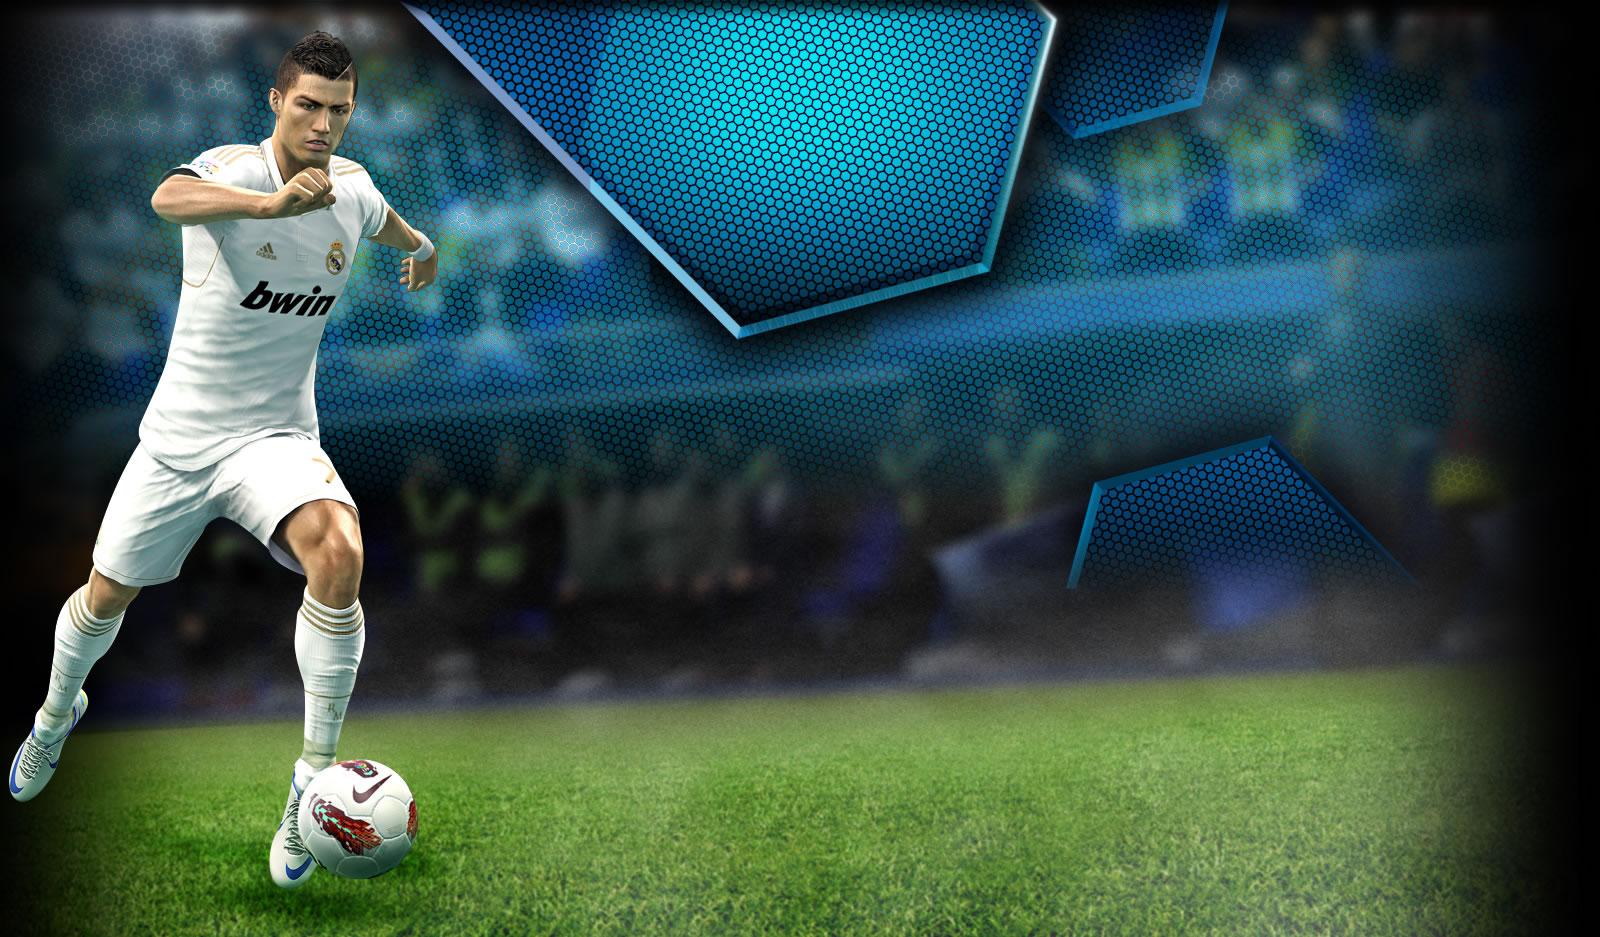 http://2.bp.blogspot.com/-j5slZoI51zc/T5MEoE6W6lI/AAAAAAAABZ8/6CnaINf_coA/s1600/PES_2013_Pro_Evolution_Soccer_2013_Ronaldo_HD_Wallpaper-gWb.jpg